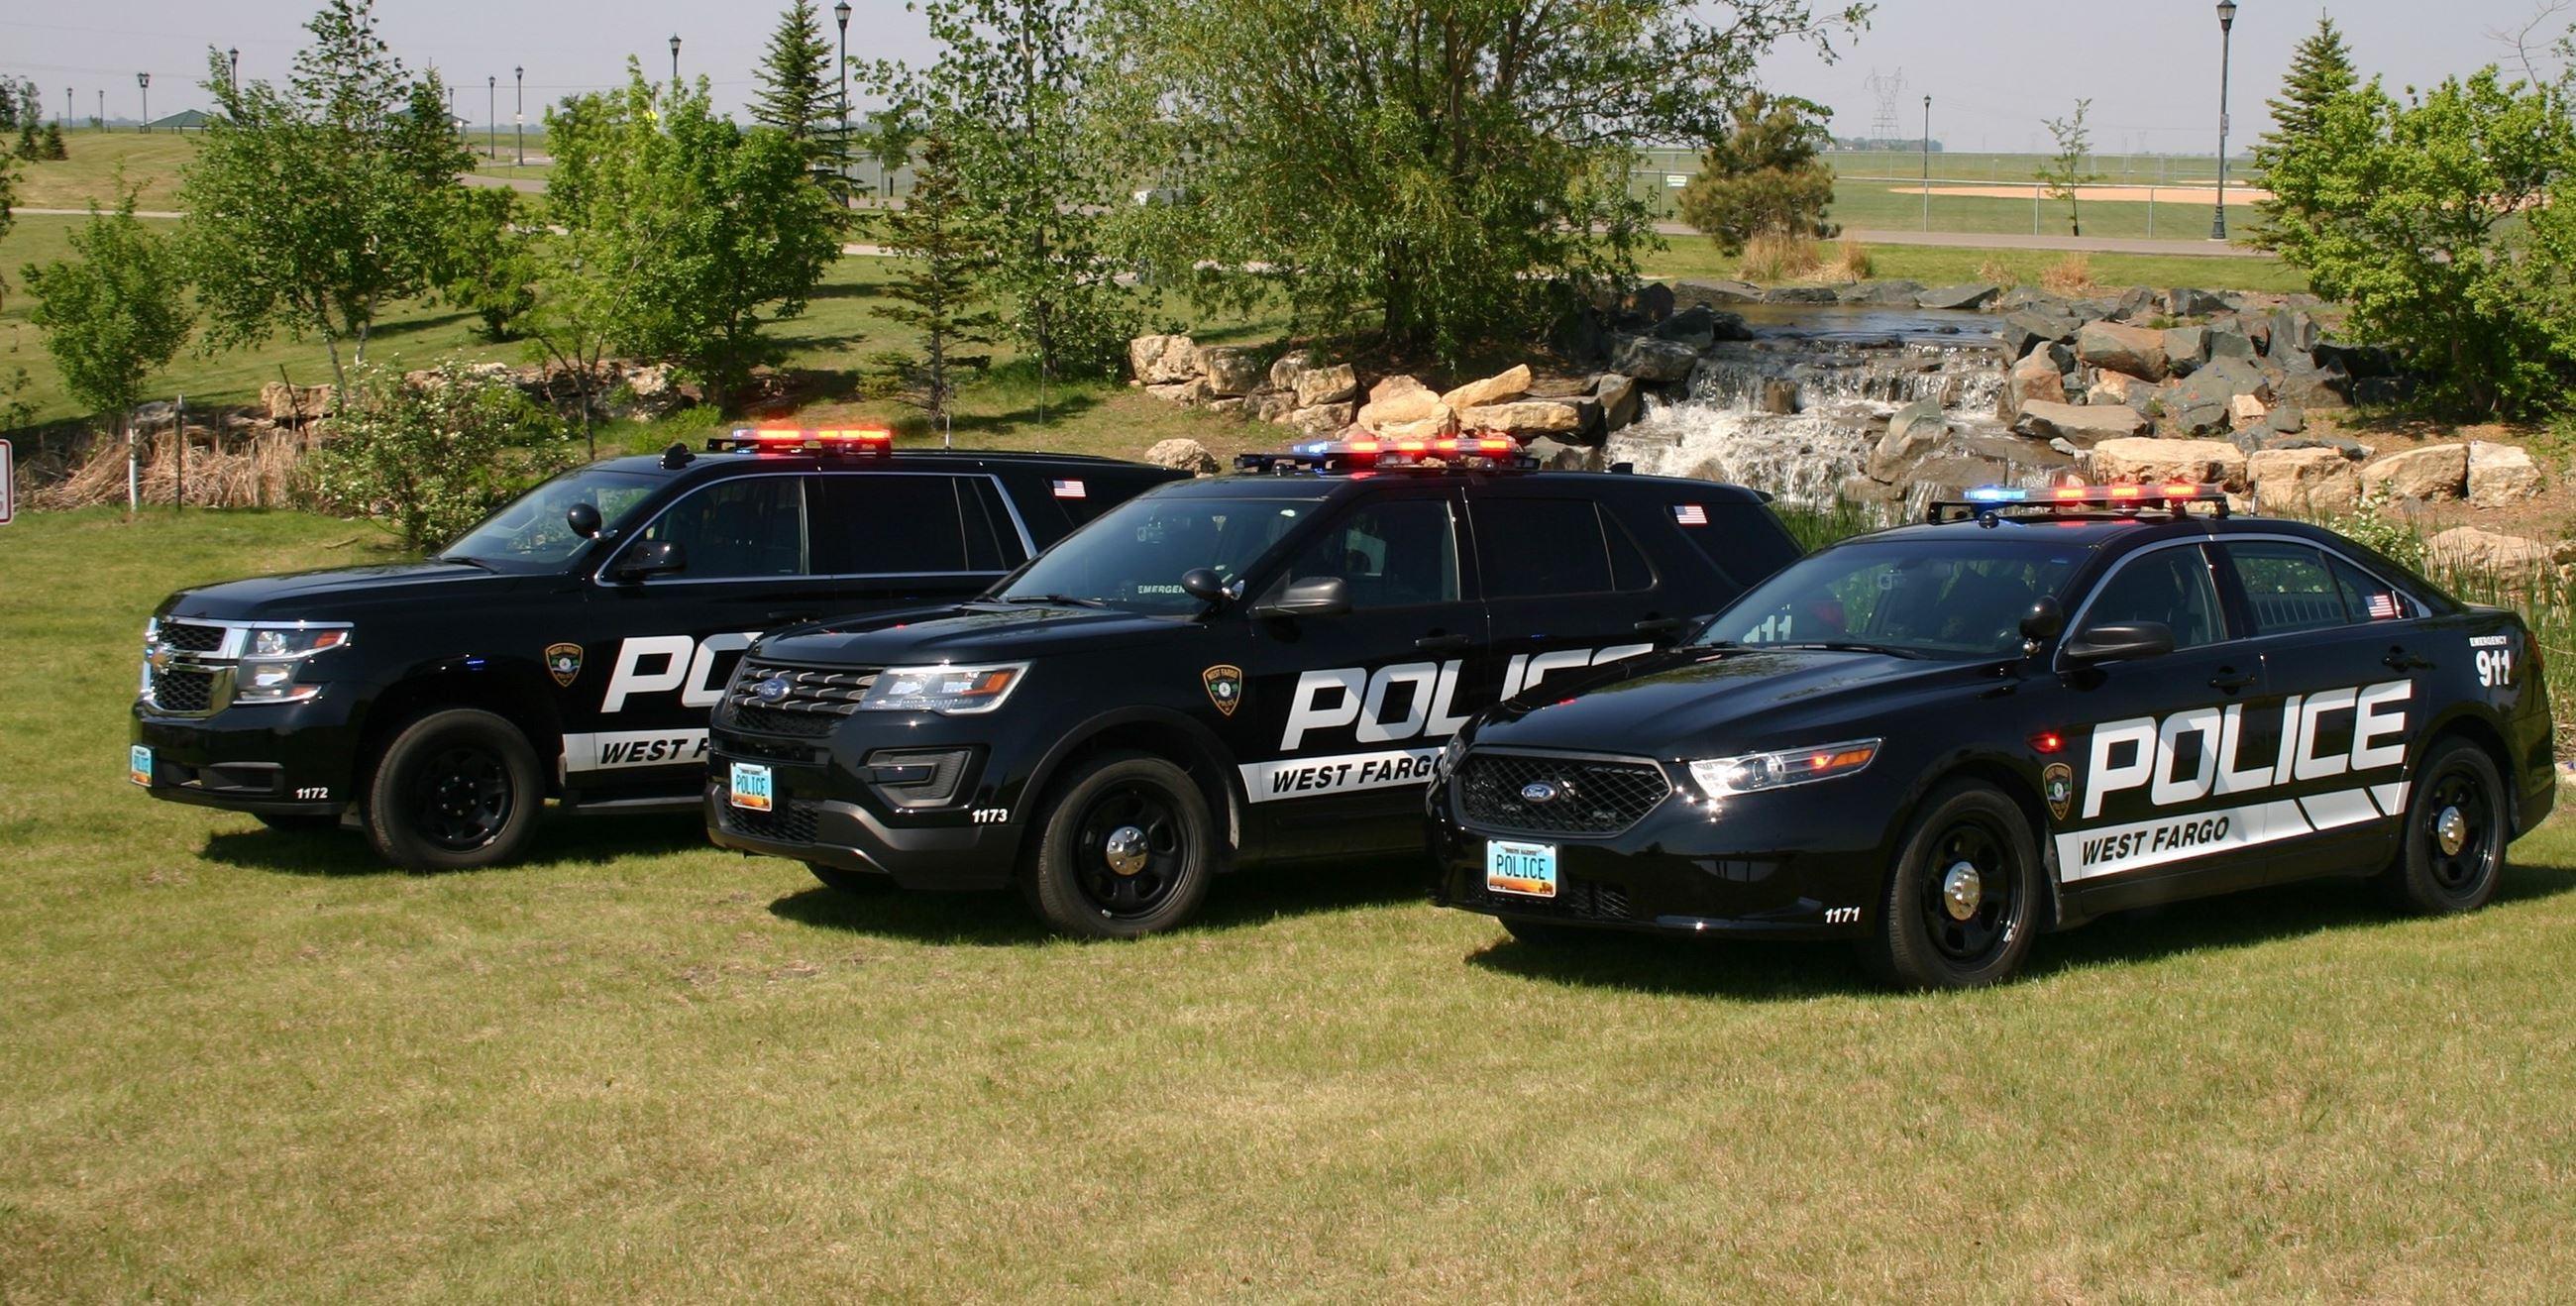 Police | West Fargo, ND